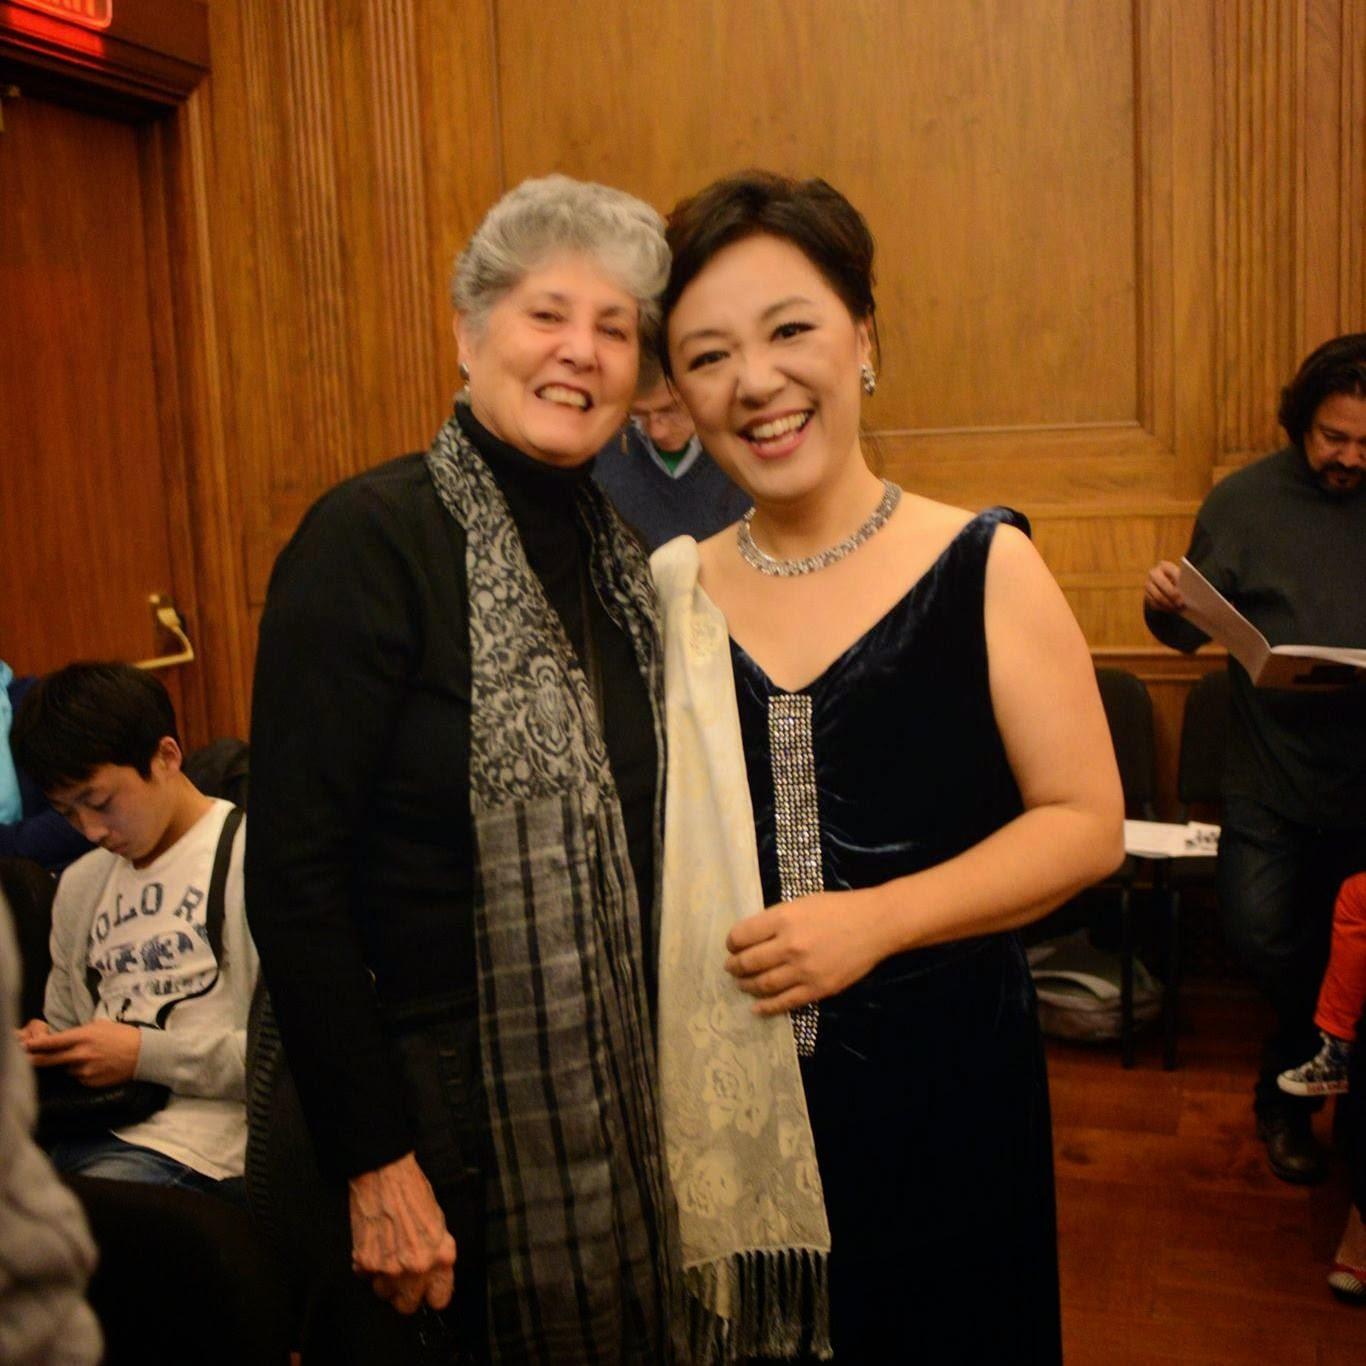 with Benita Valente at Curtis Field Recital Hall